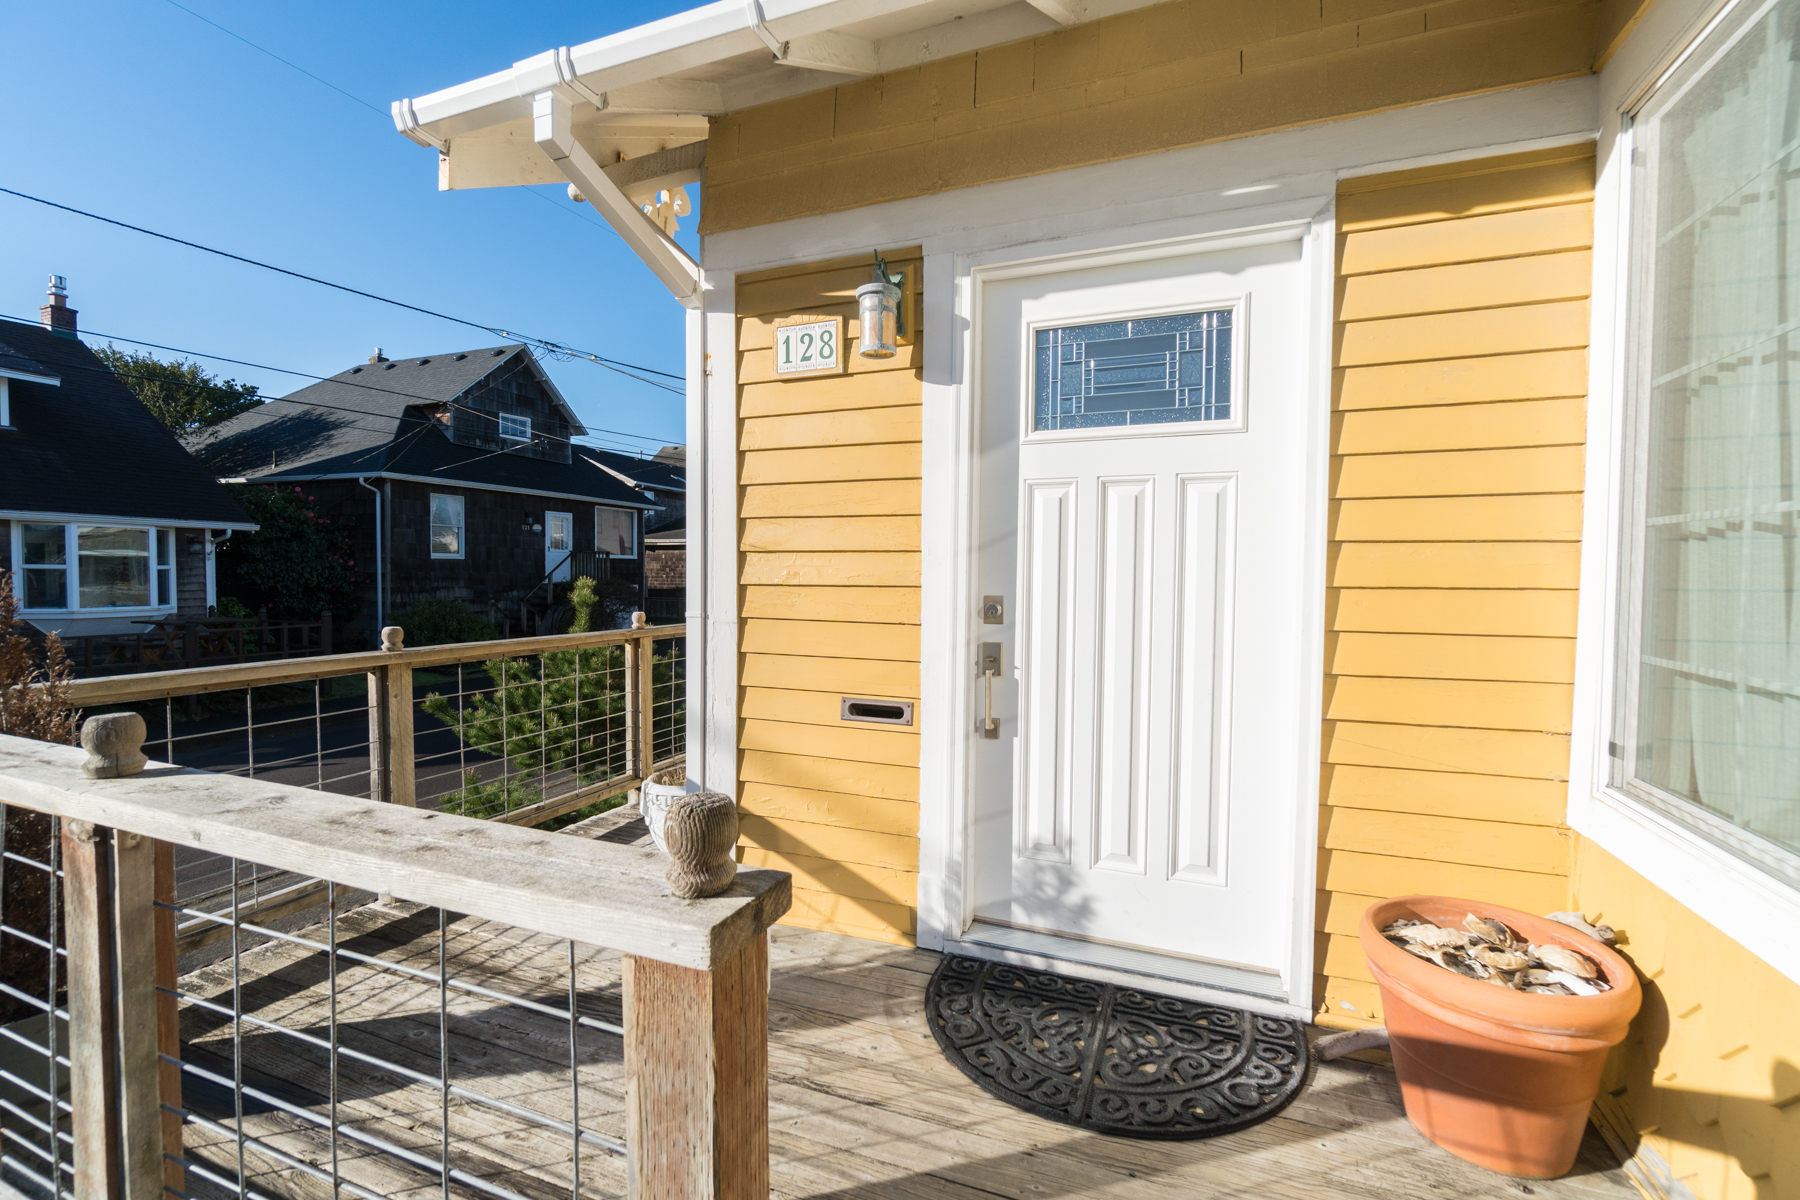 Beach House Vacation Rentals Washington State